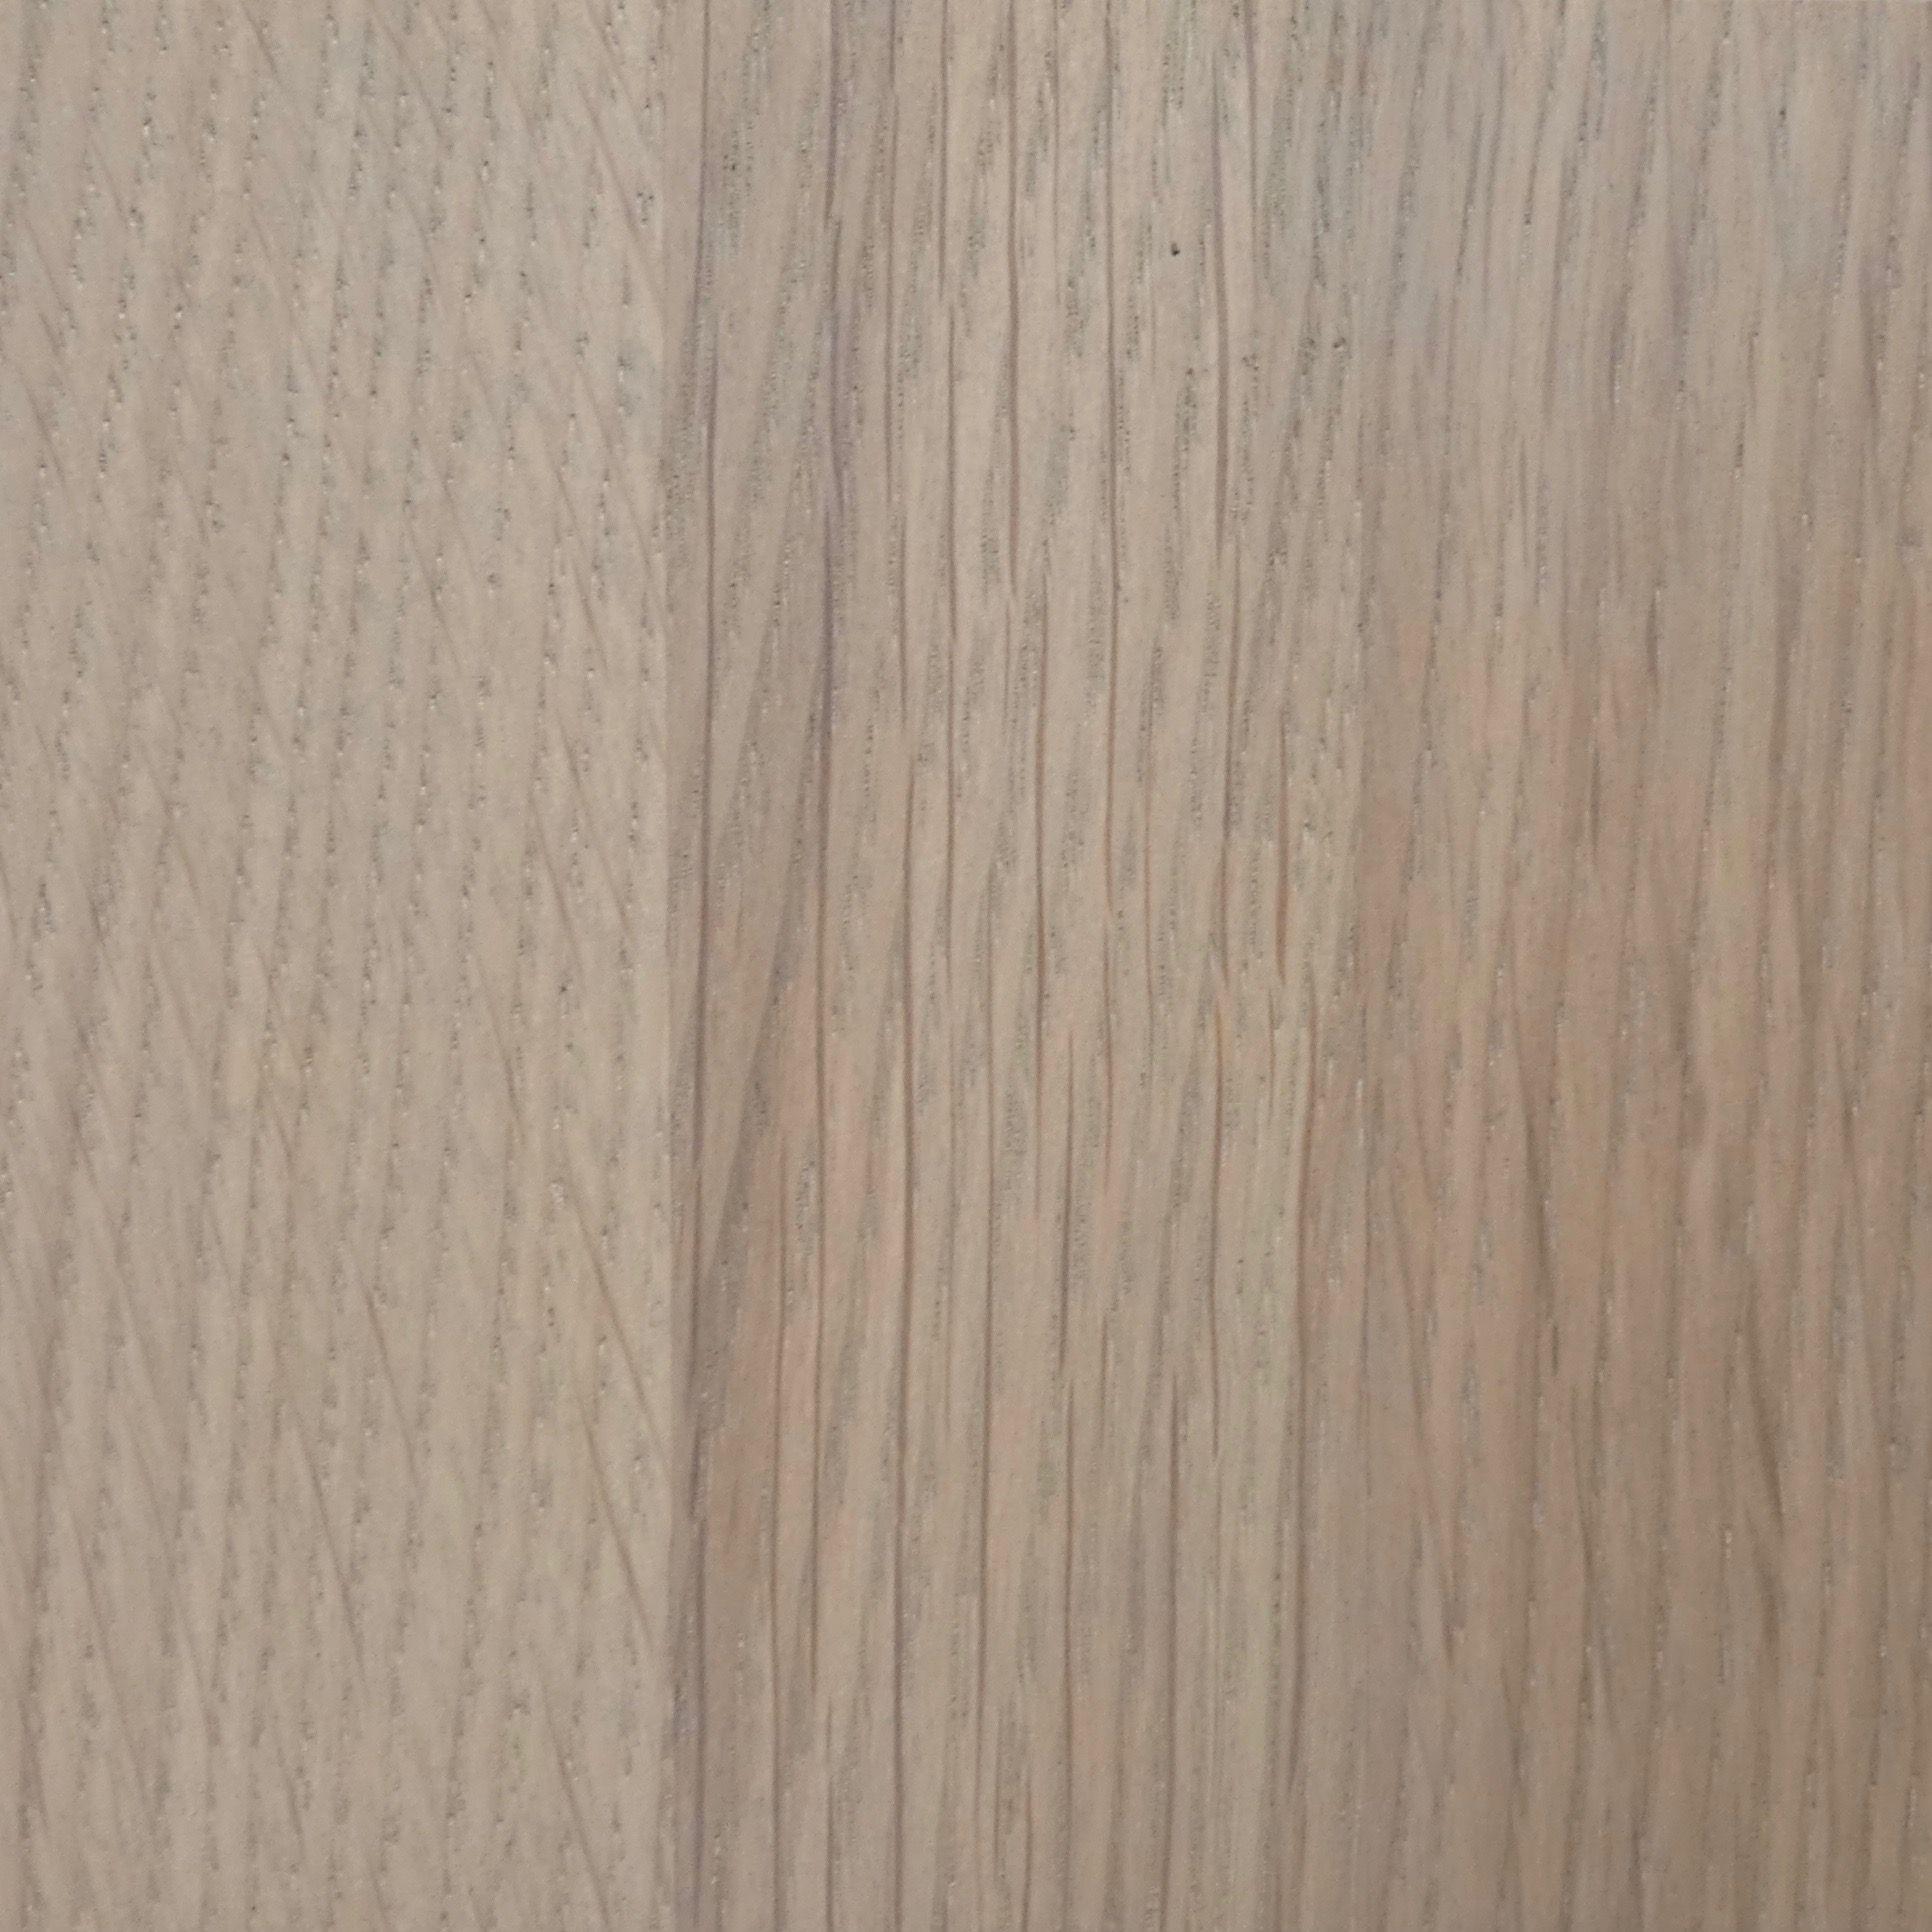 Napier Turquoise